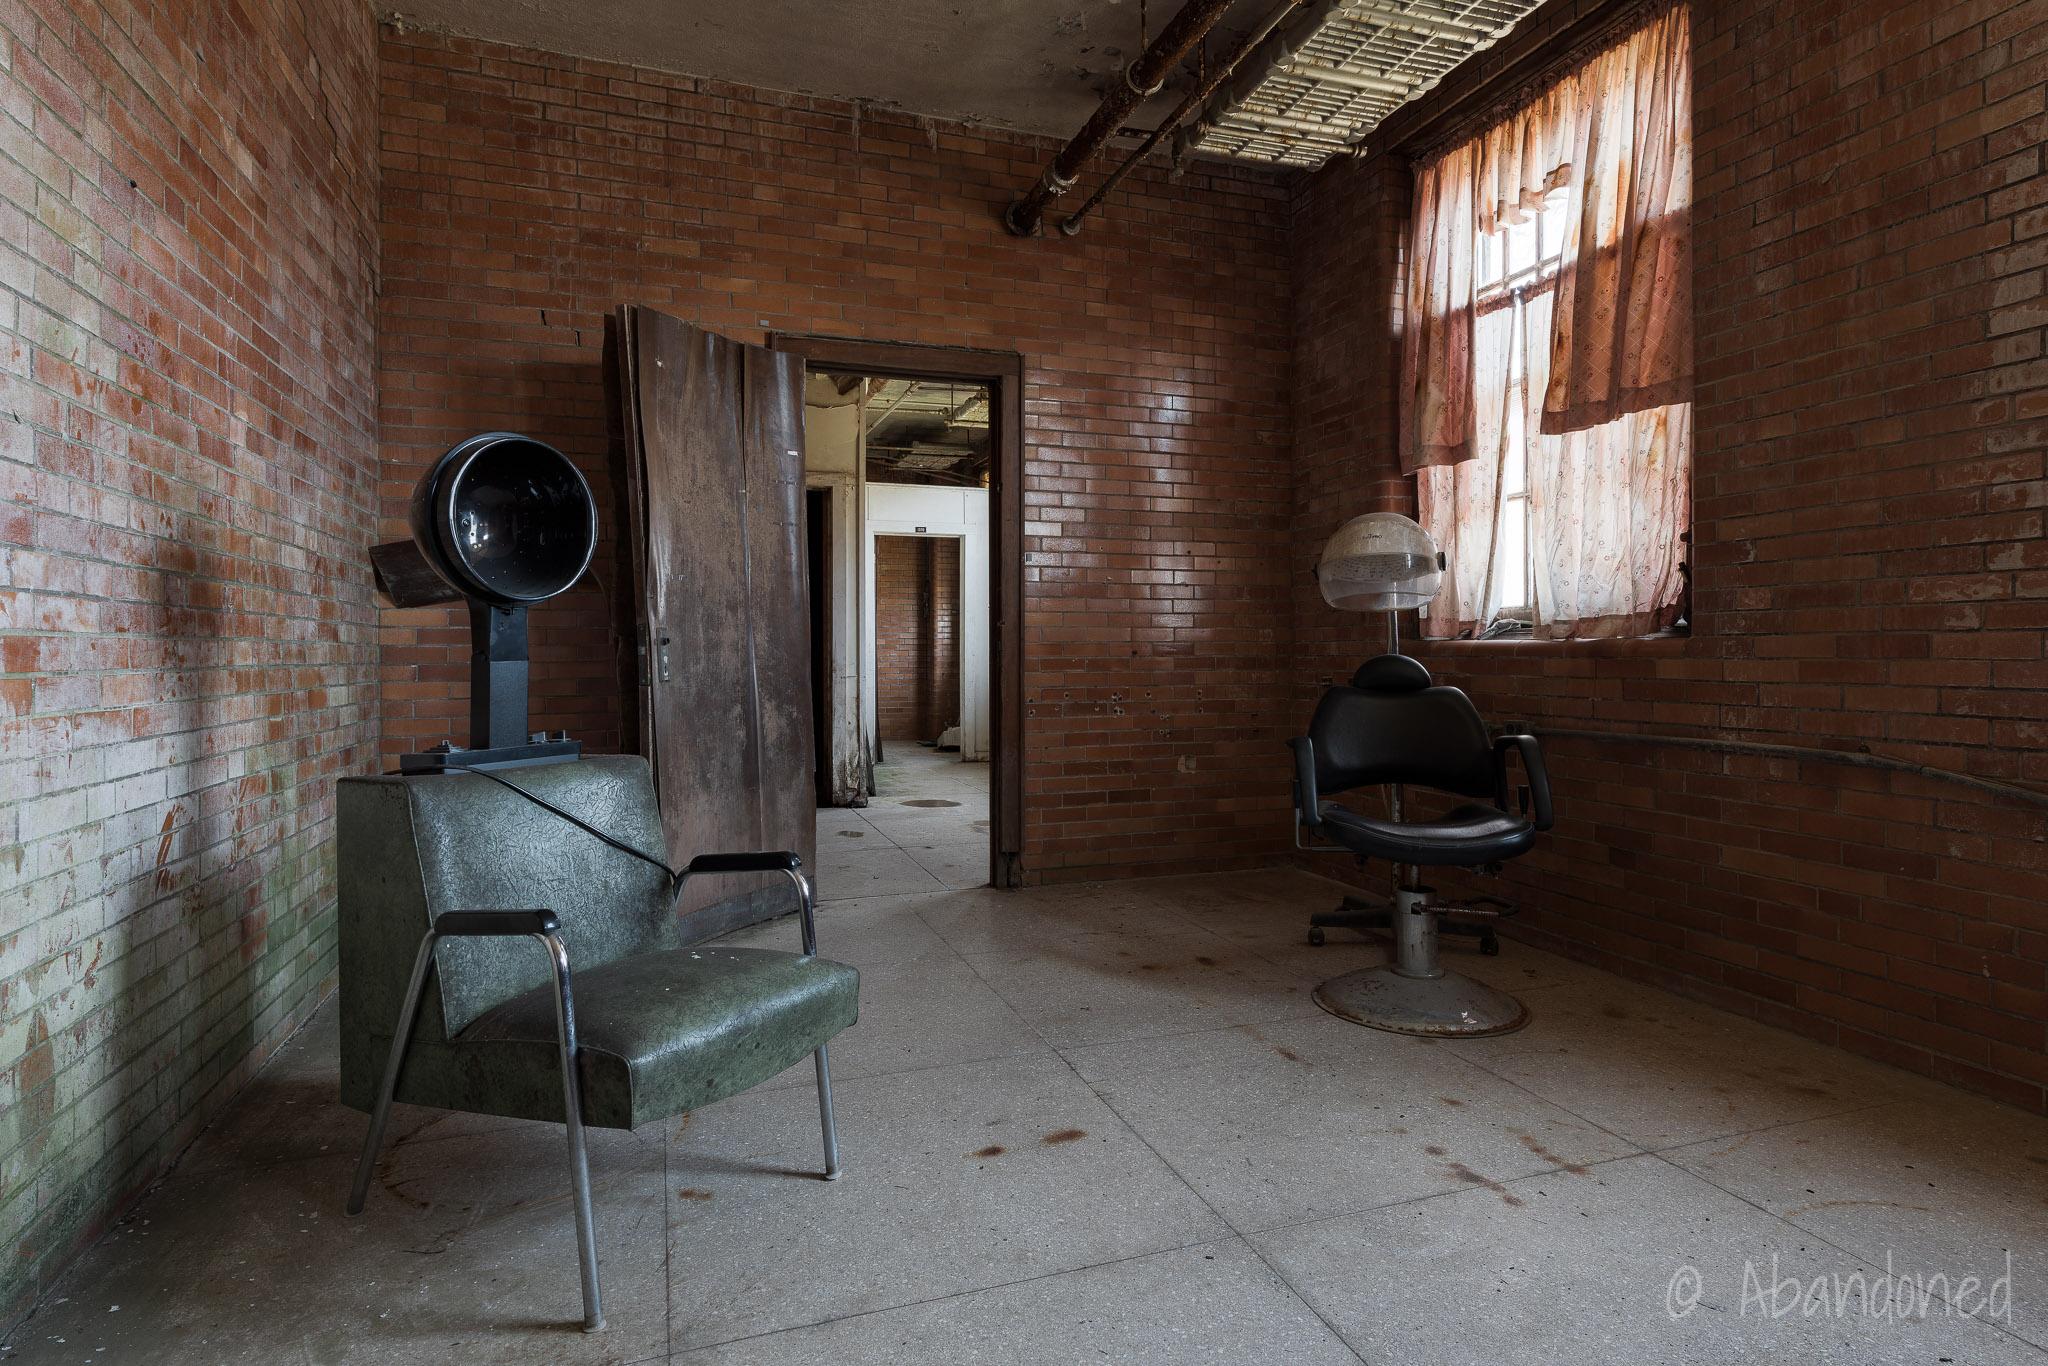 Trans-Allegheny Lunatic Asylum Abandoned Hairdresser Equipment